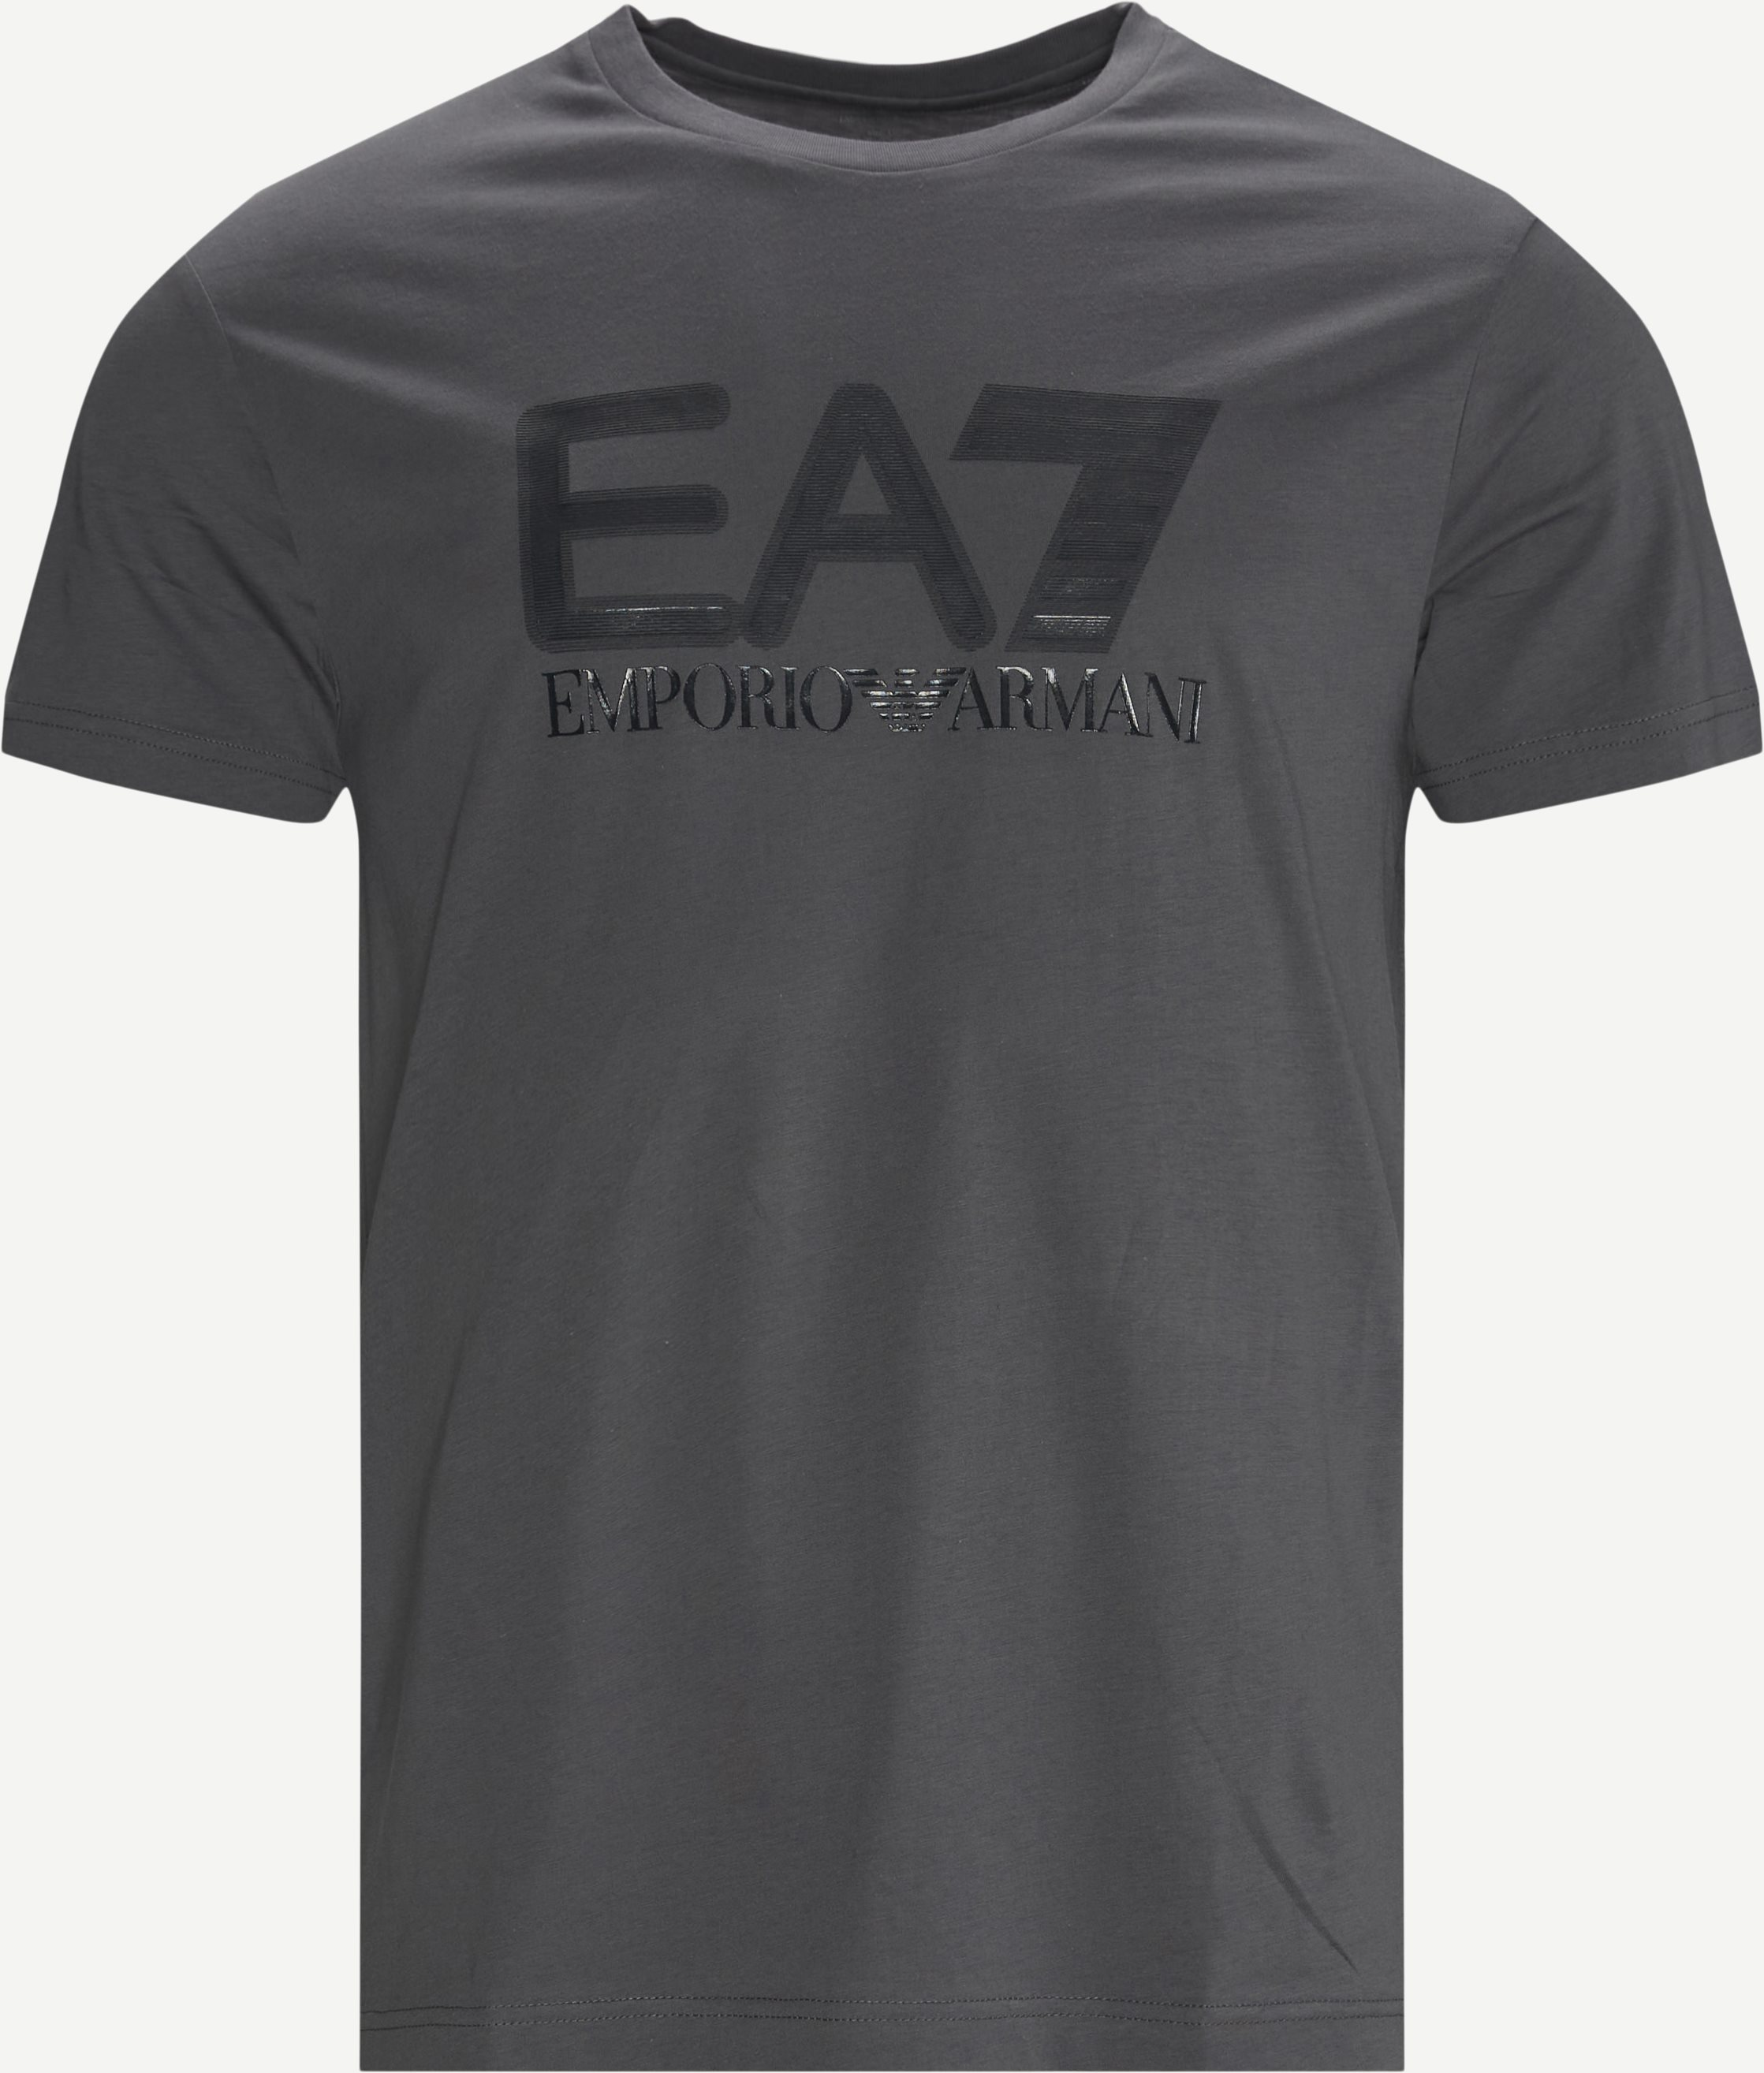 PJM9Z Logo T-shirt - T-shirts - Regular fit - Grå